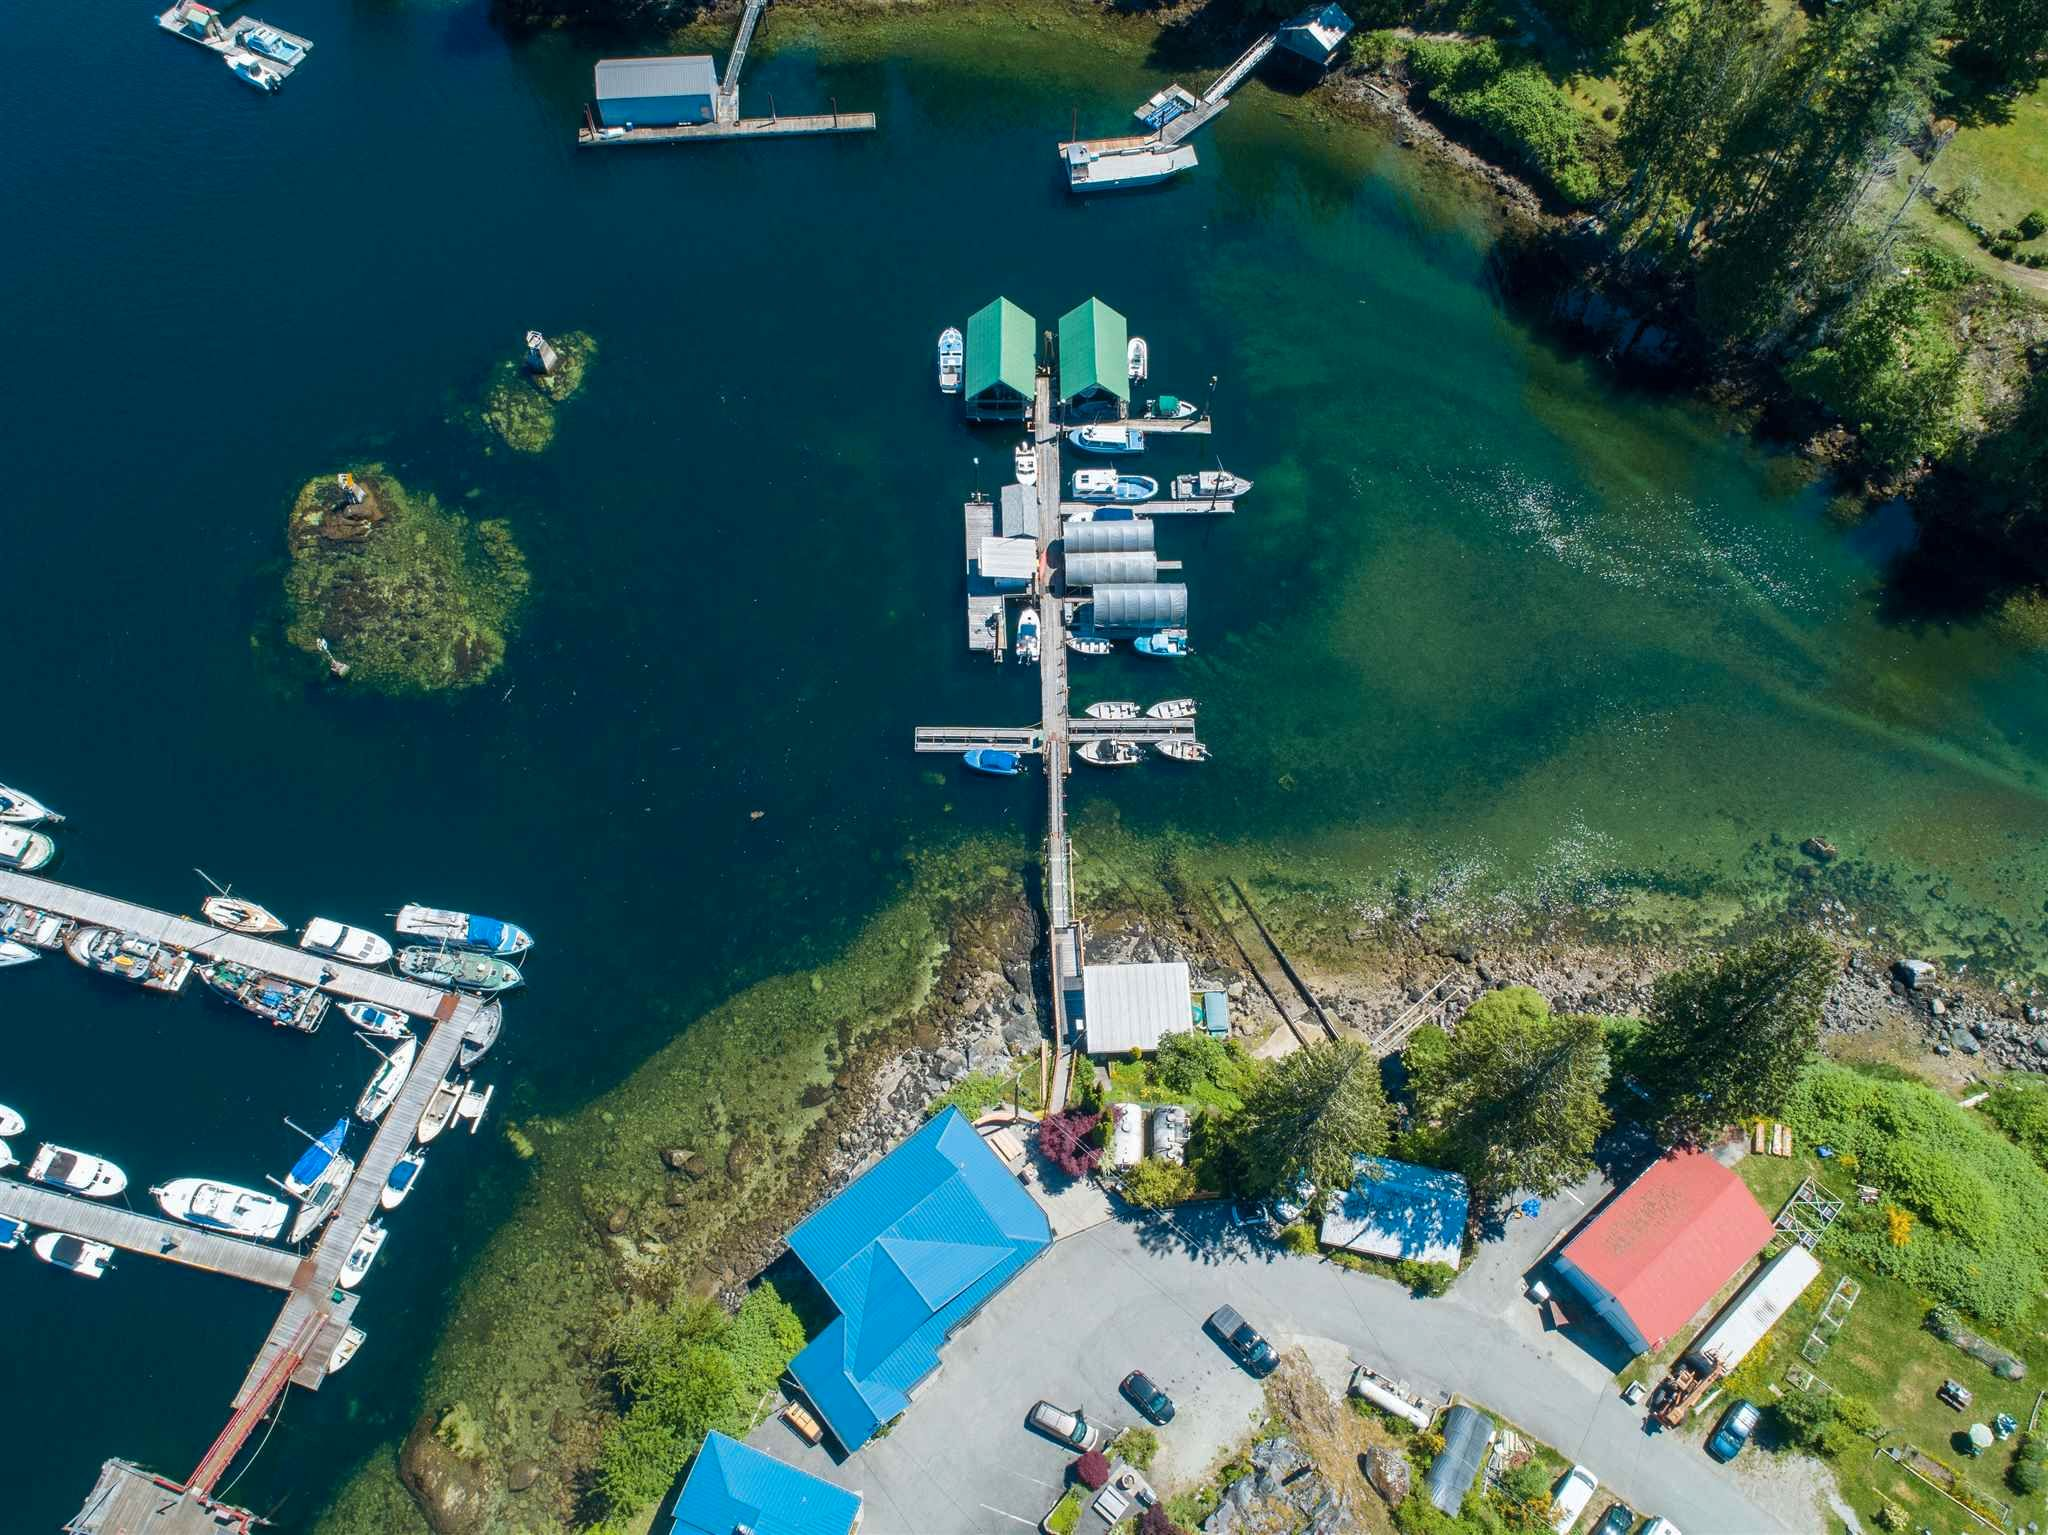 Photo 9: Photos: 6781 BATHGATE Road in Egmont: Pender Harbour Egmont House for sale (Sunshine Coast)  : MLS®# R2593981